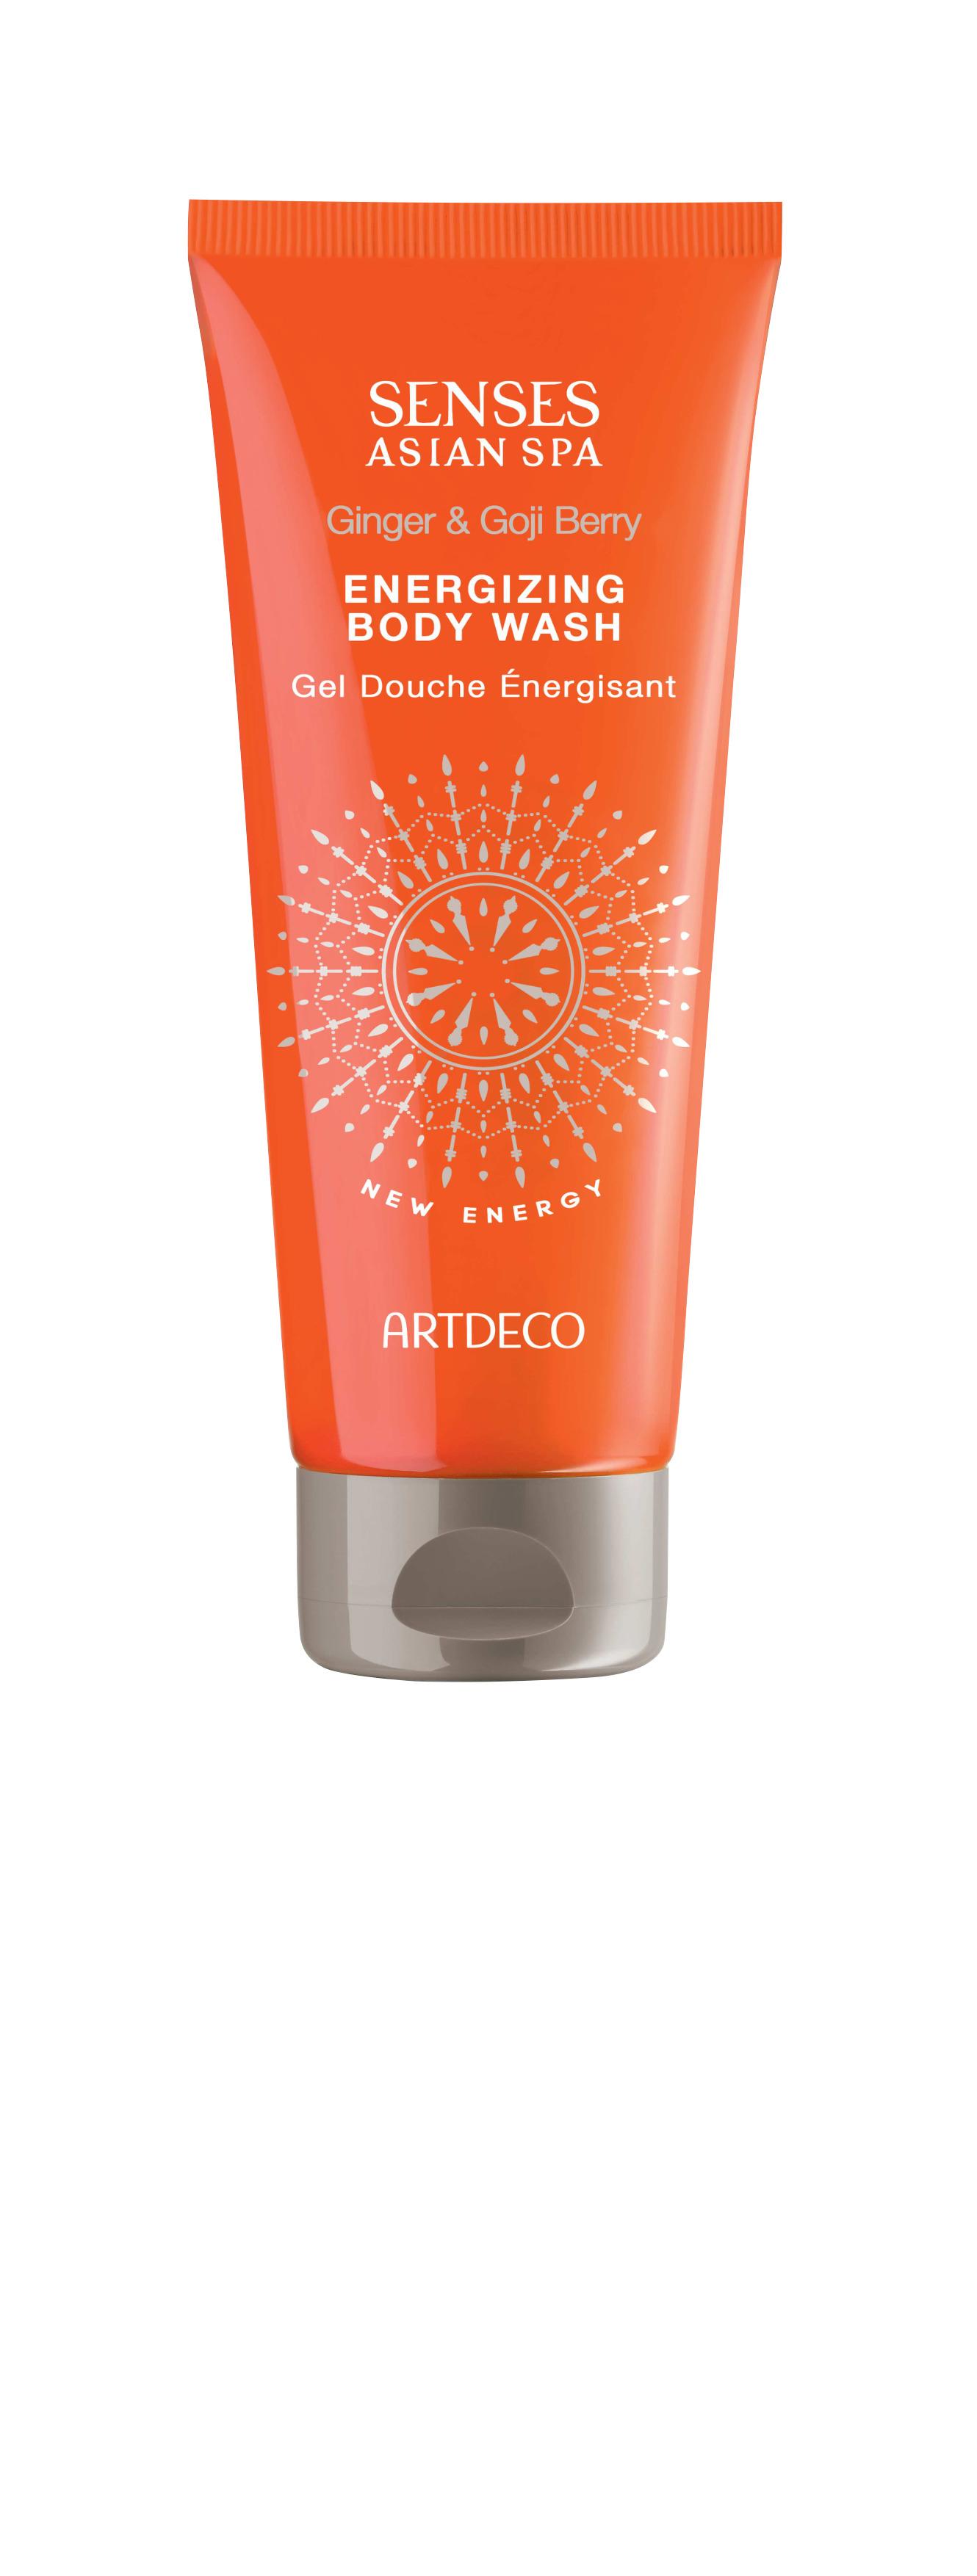 Artdeco гель для душа тонизирующий Energizing body wash, new energy, 200 мл energizing w edt spr